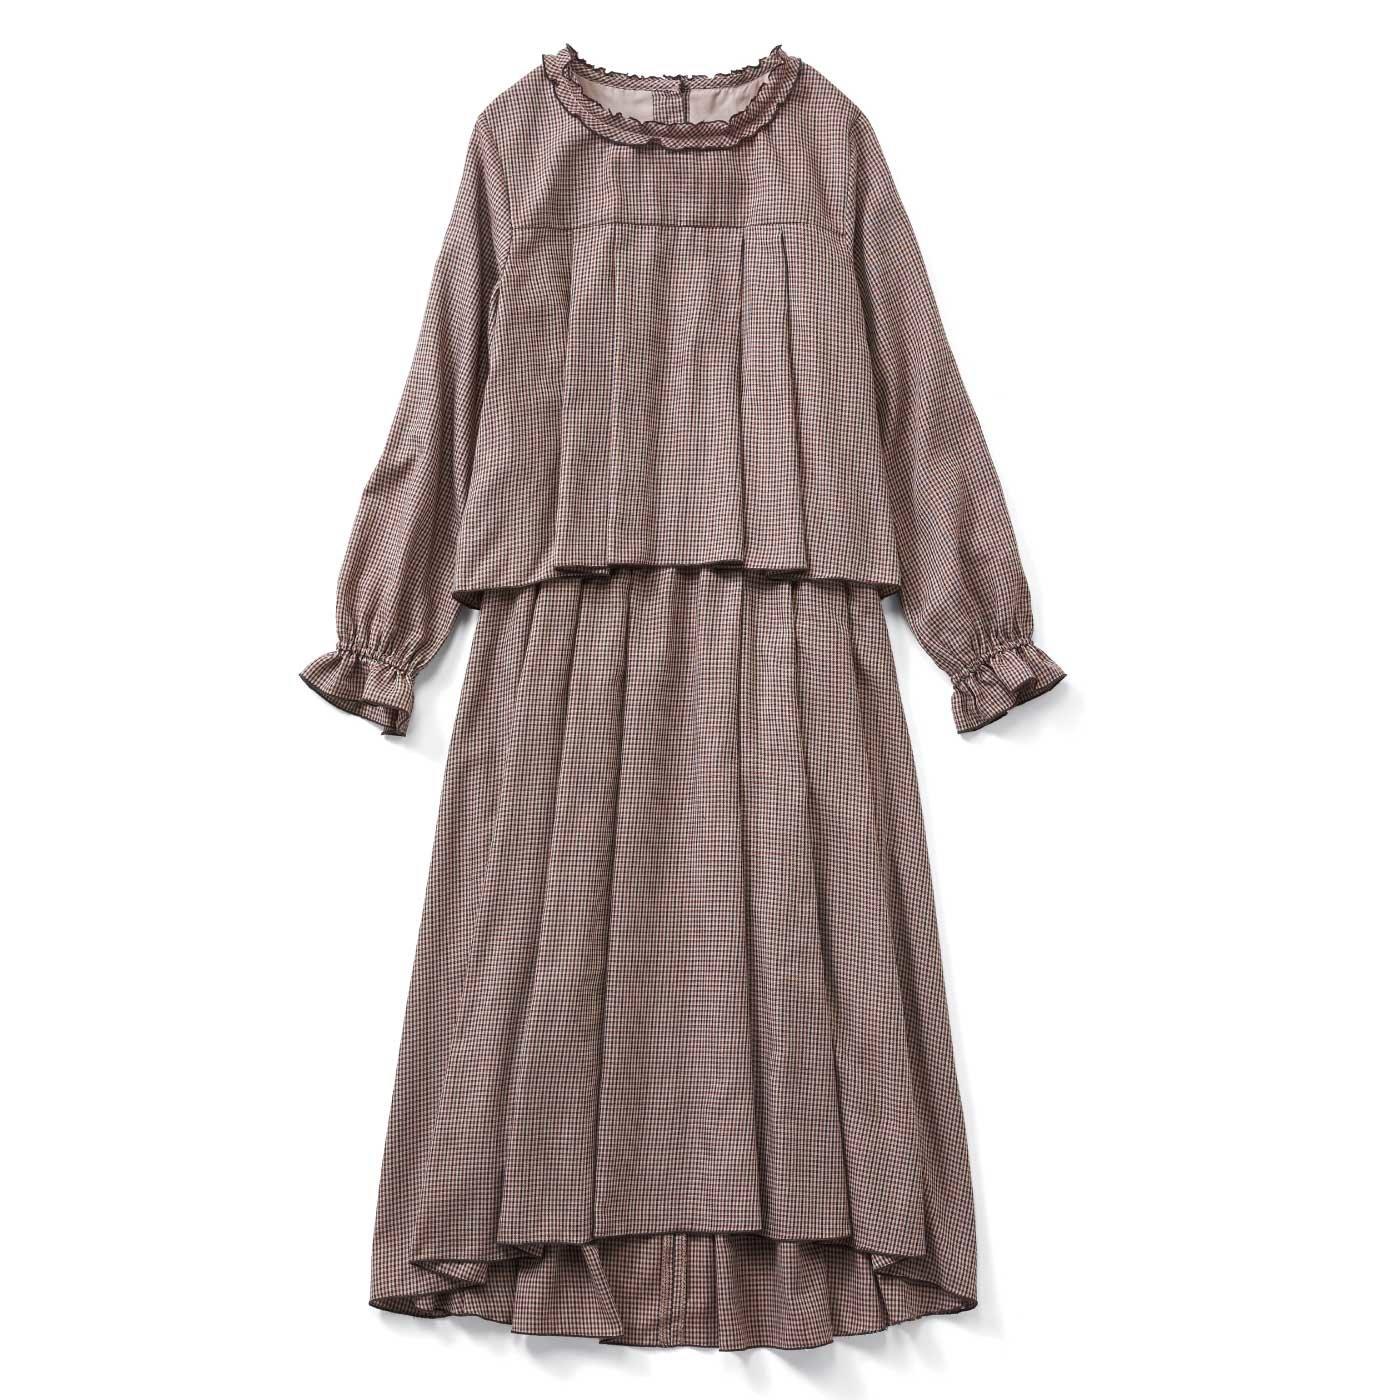 t.yamai×IEDIT[イディット] フリル衿のチェックワンピース〈ブラウン〉